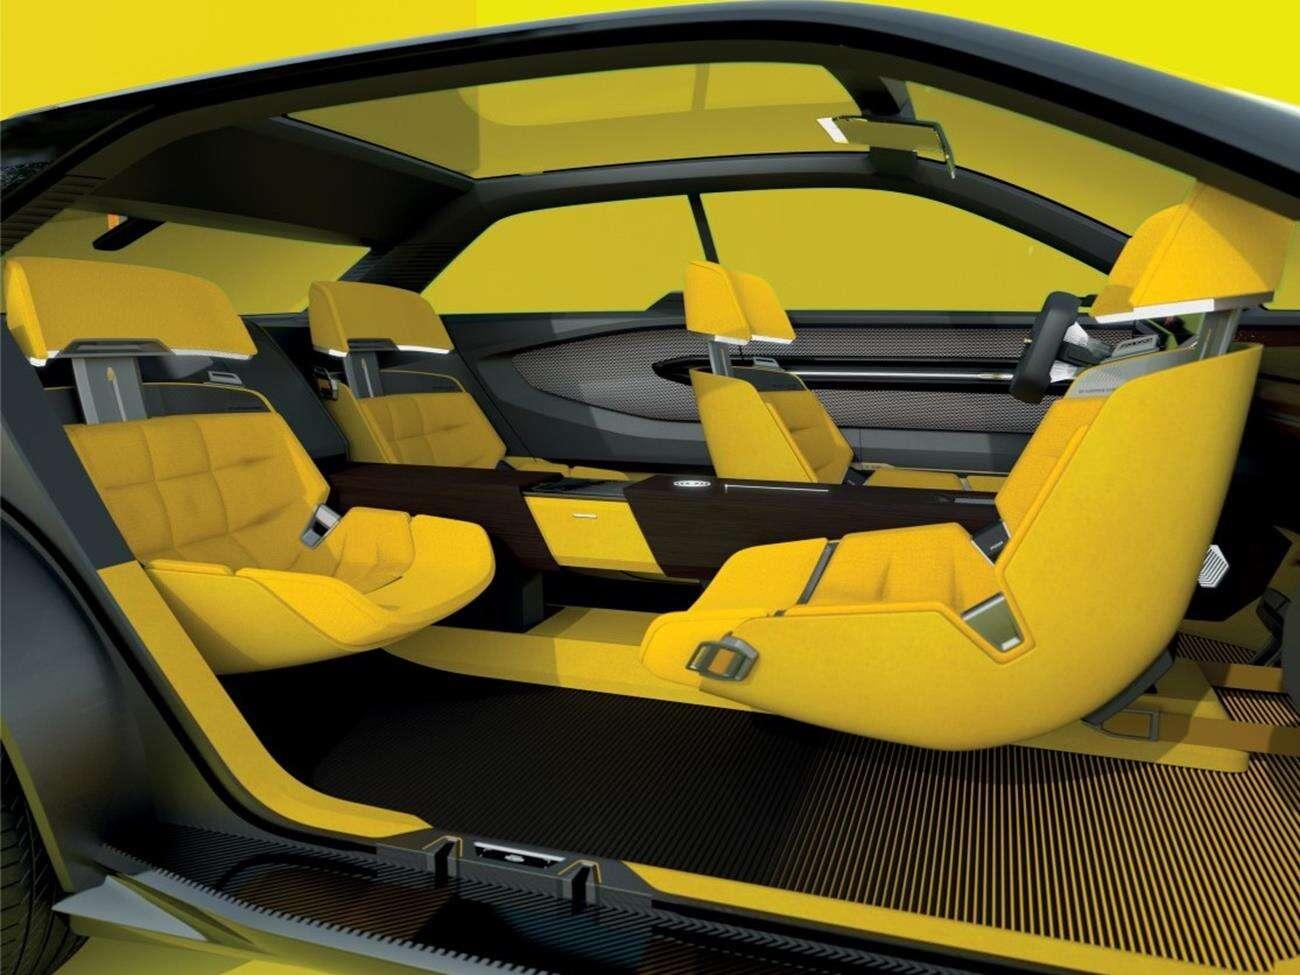 Koncept Morphoz od Renaulta, Morphoz, Renault Morphoz, koncept Morphoz